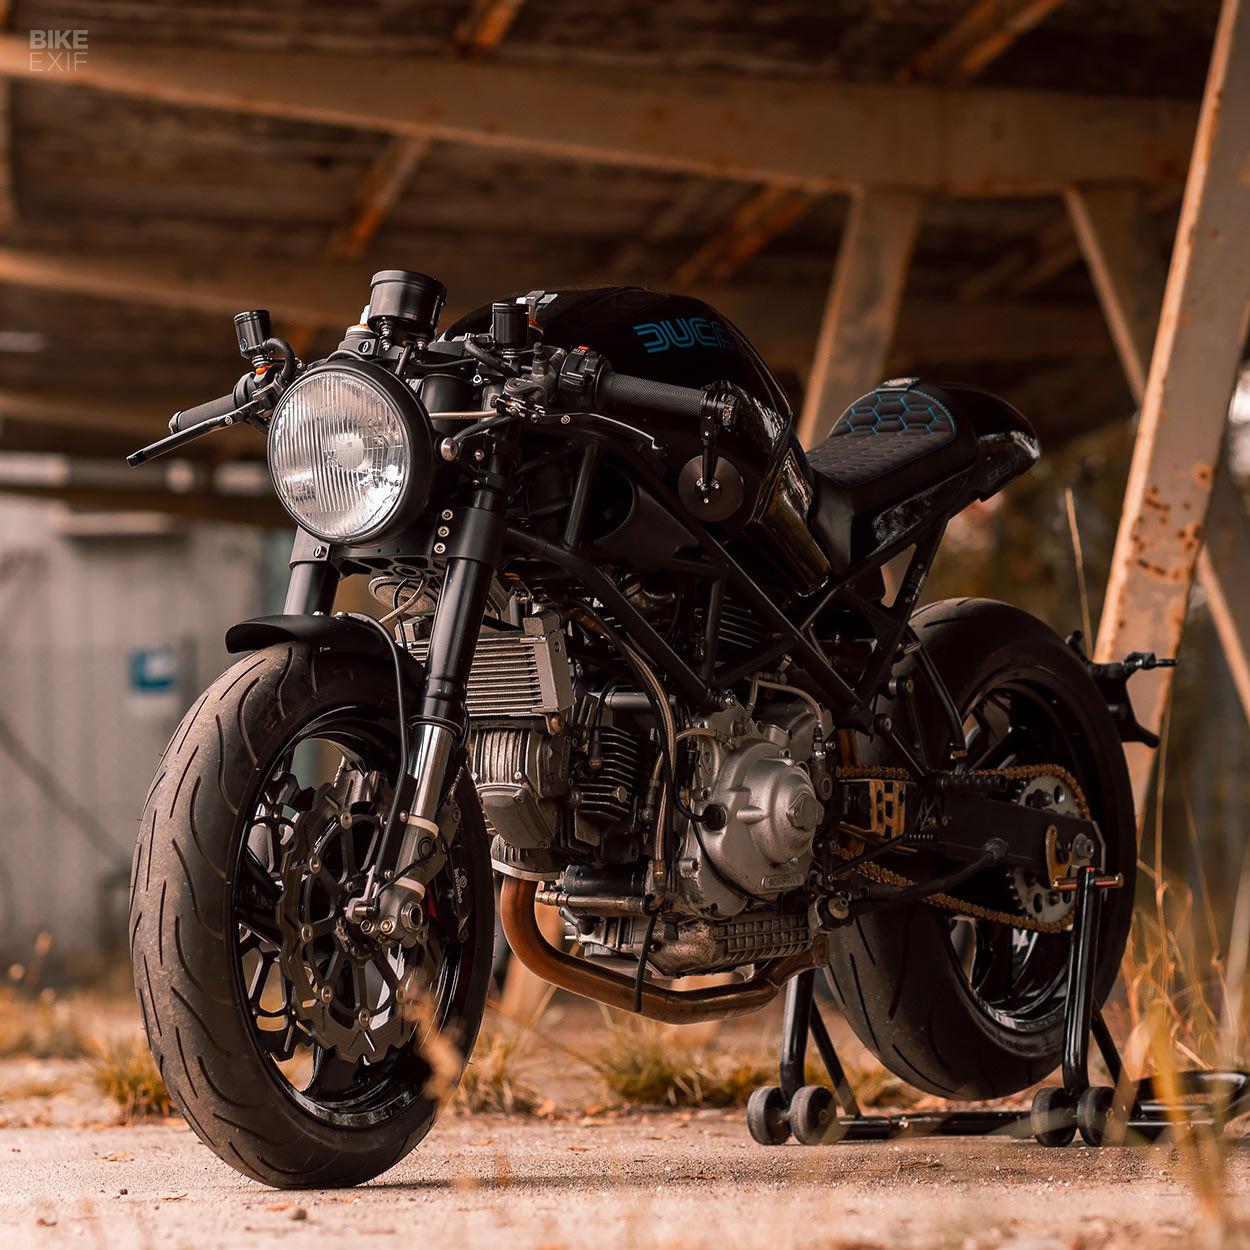 Ducati Monster 900 custom by NCT Motorcycles